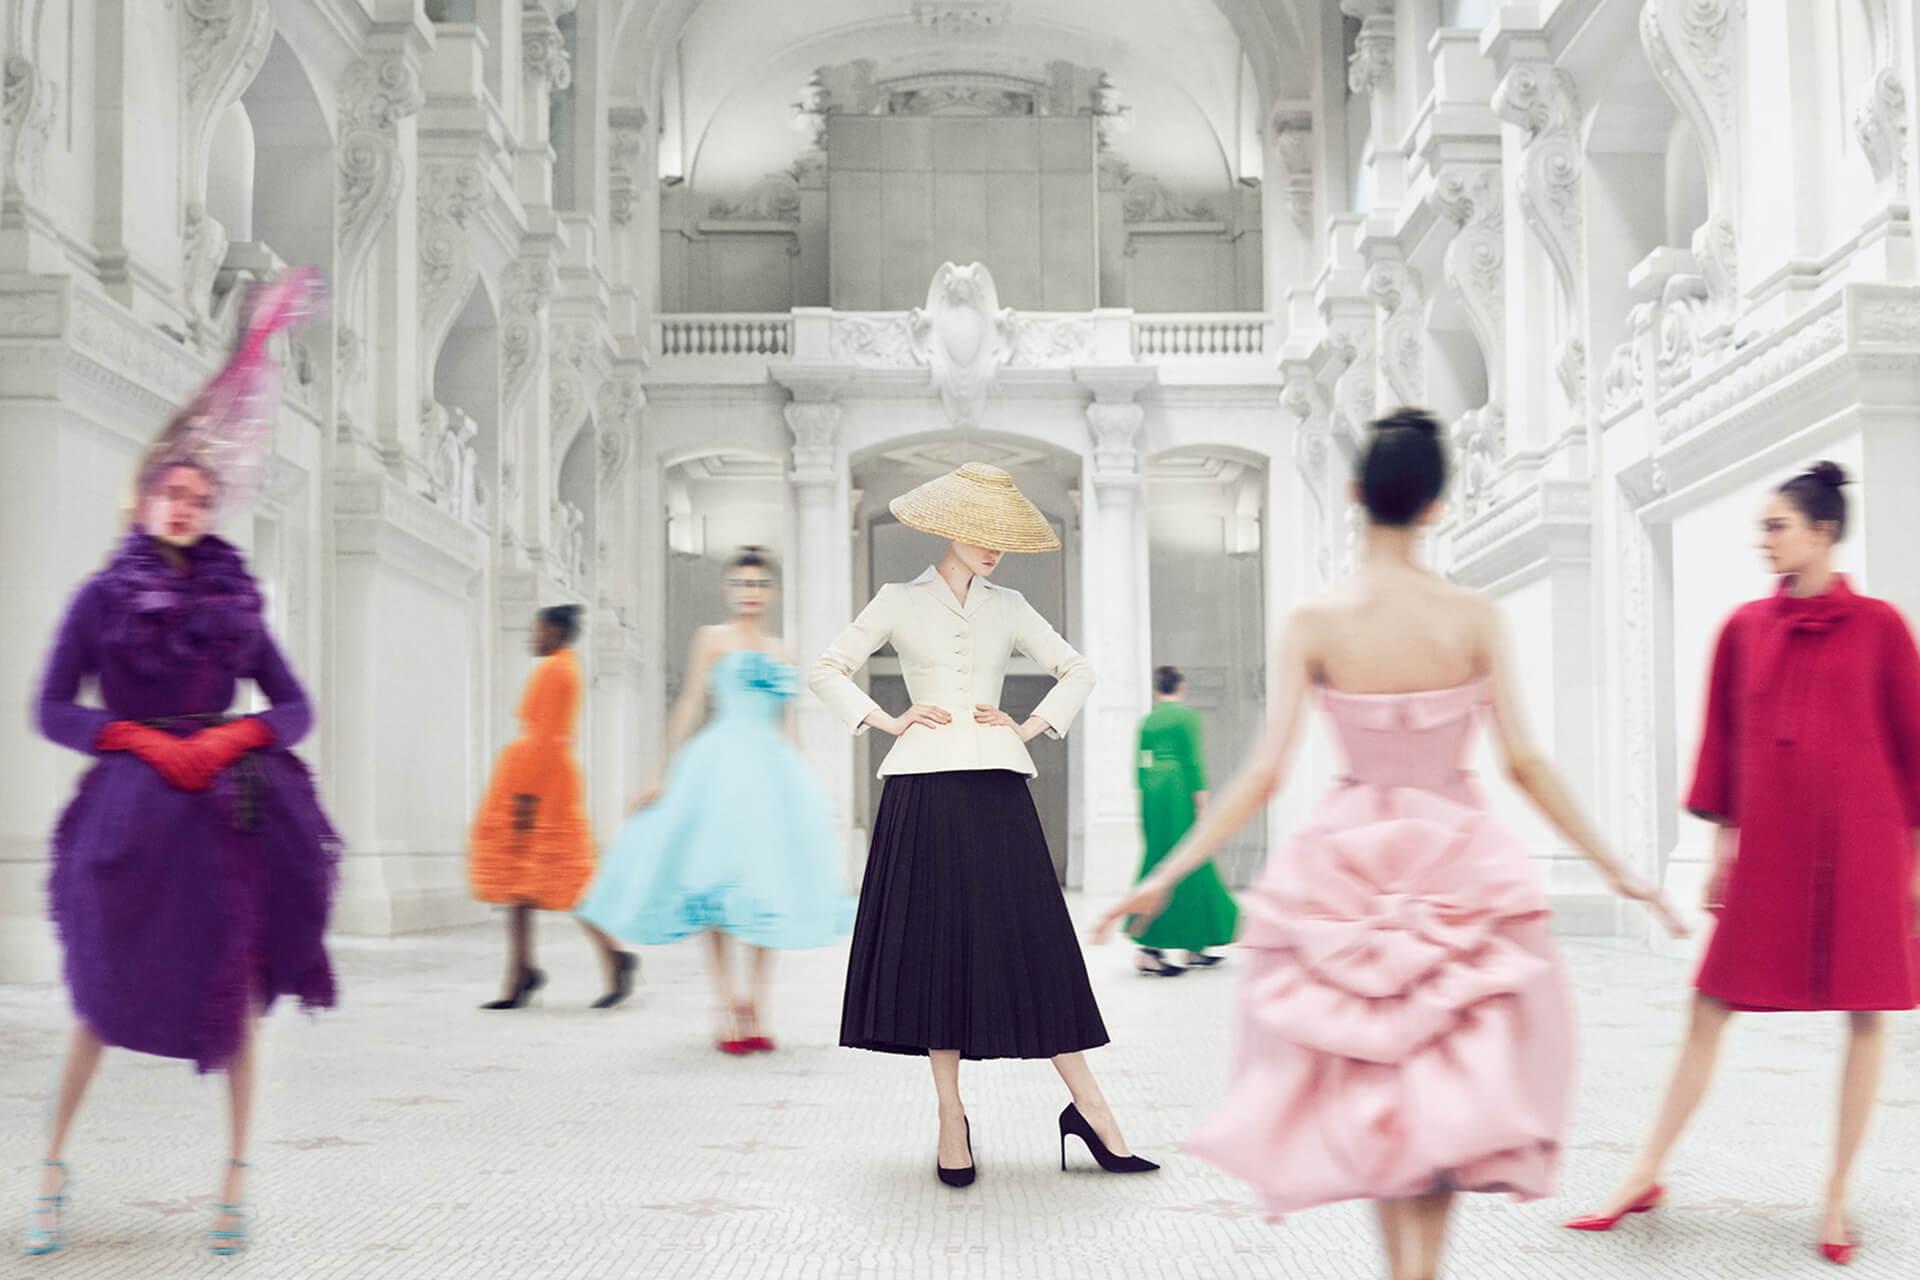 5fa93348002 Dior J adore Paris exhibition - Lorette   Jasmin Consignment Shop in ...